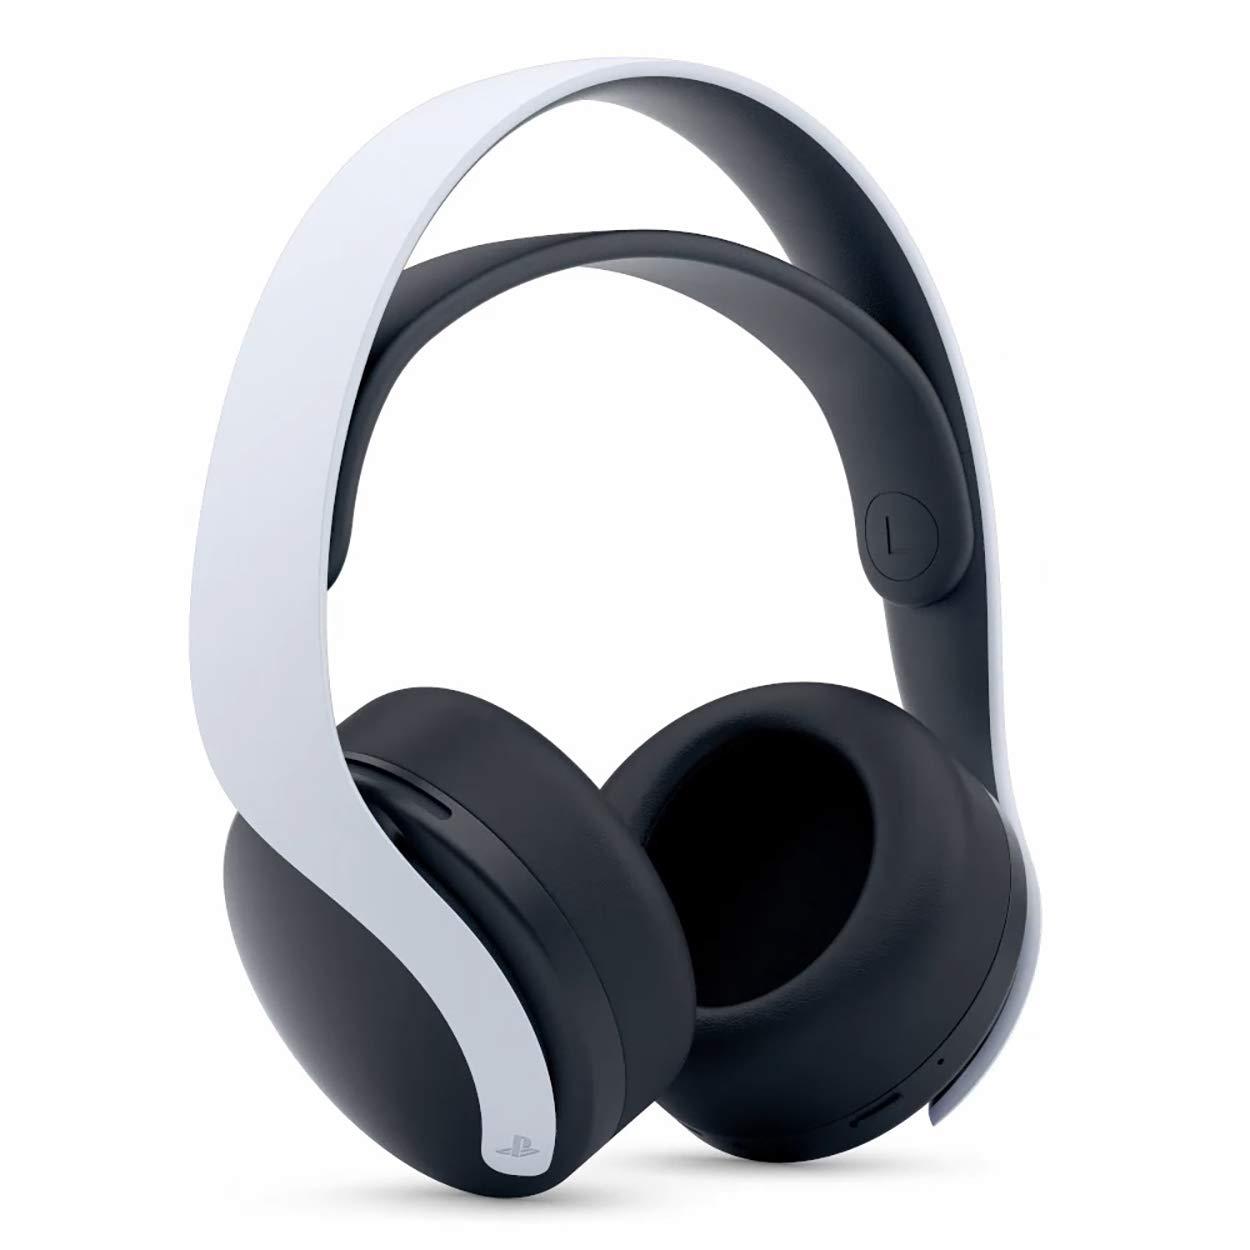 Sony PULSE 3D-Wireless Headset [PlayStation 5] (Amazon/MM)